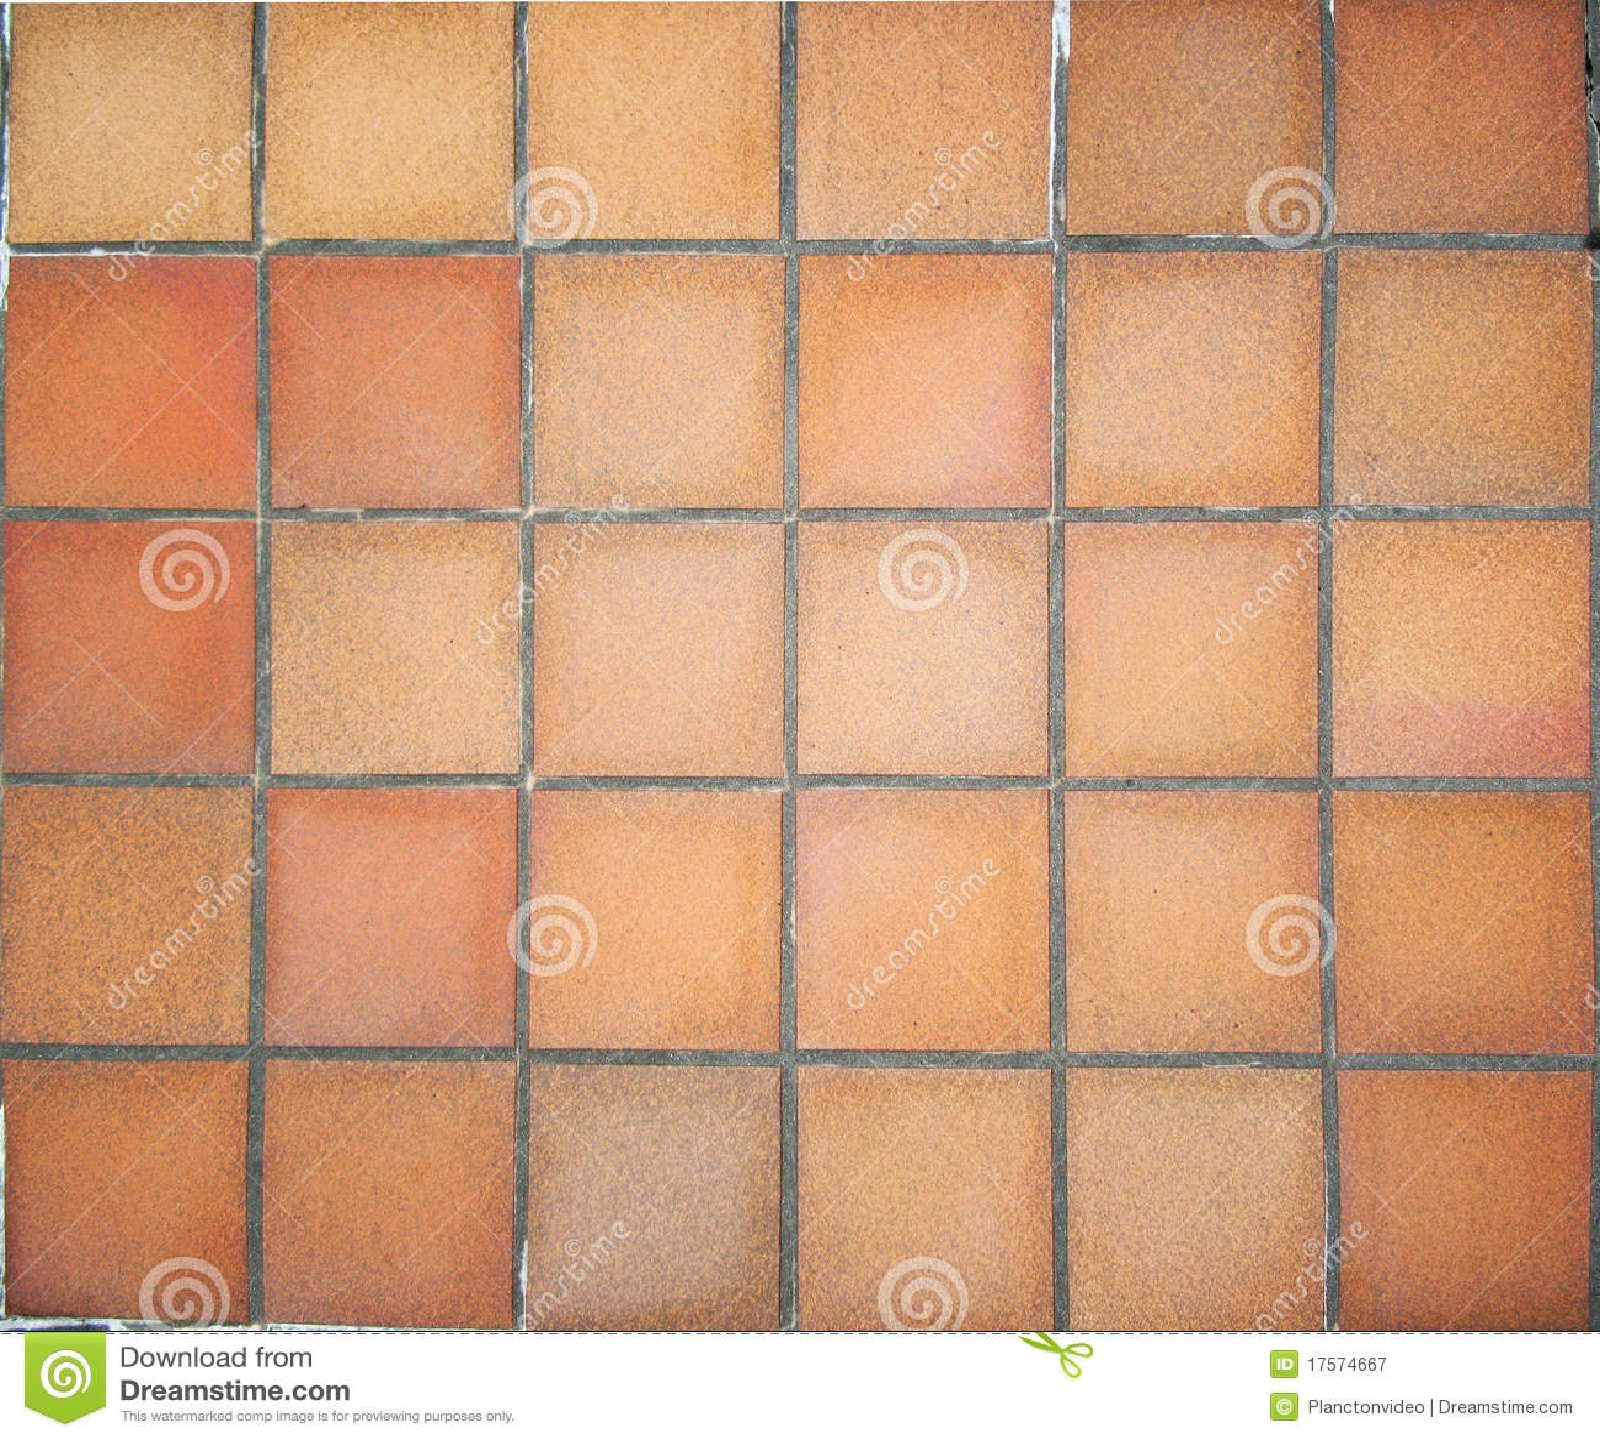 terracotta floor tiles stock image image of background. Black Bedroom Furniture Sets. Home Design Ideas